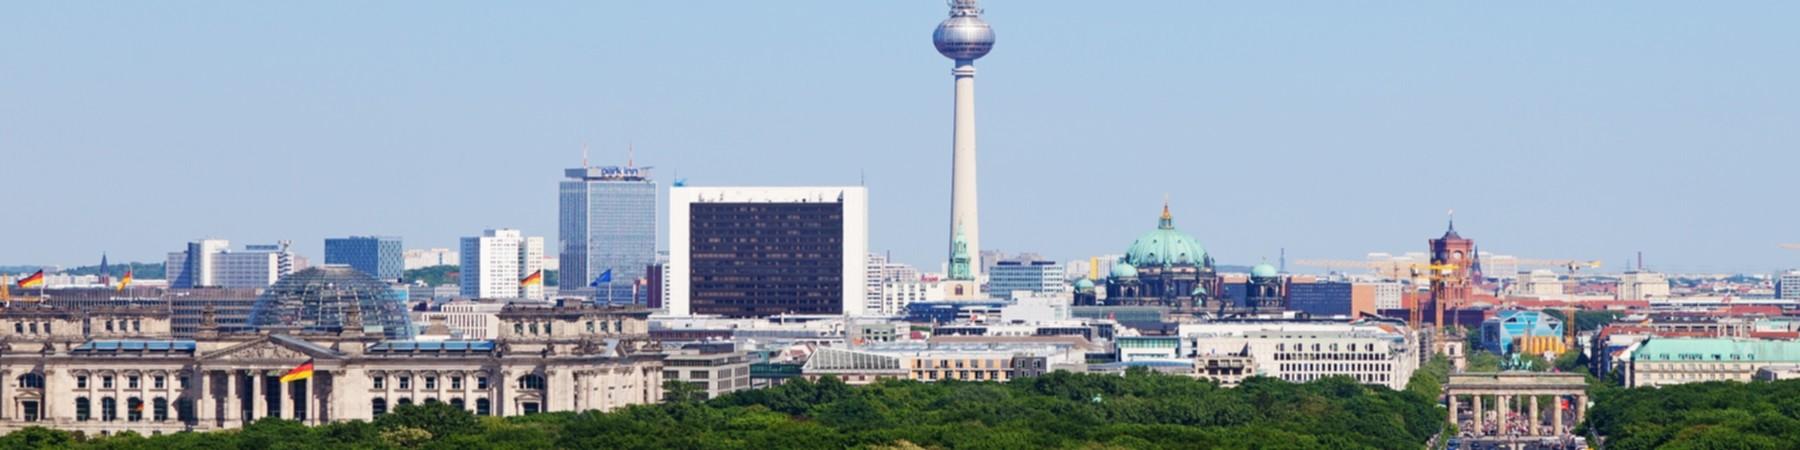 Wikitravel Berlin Banner